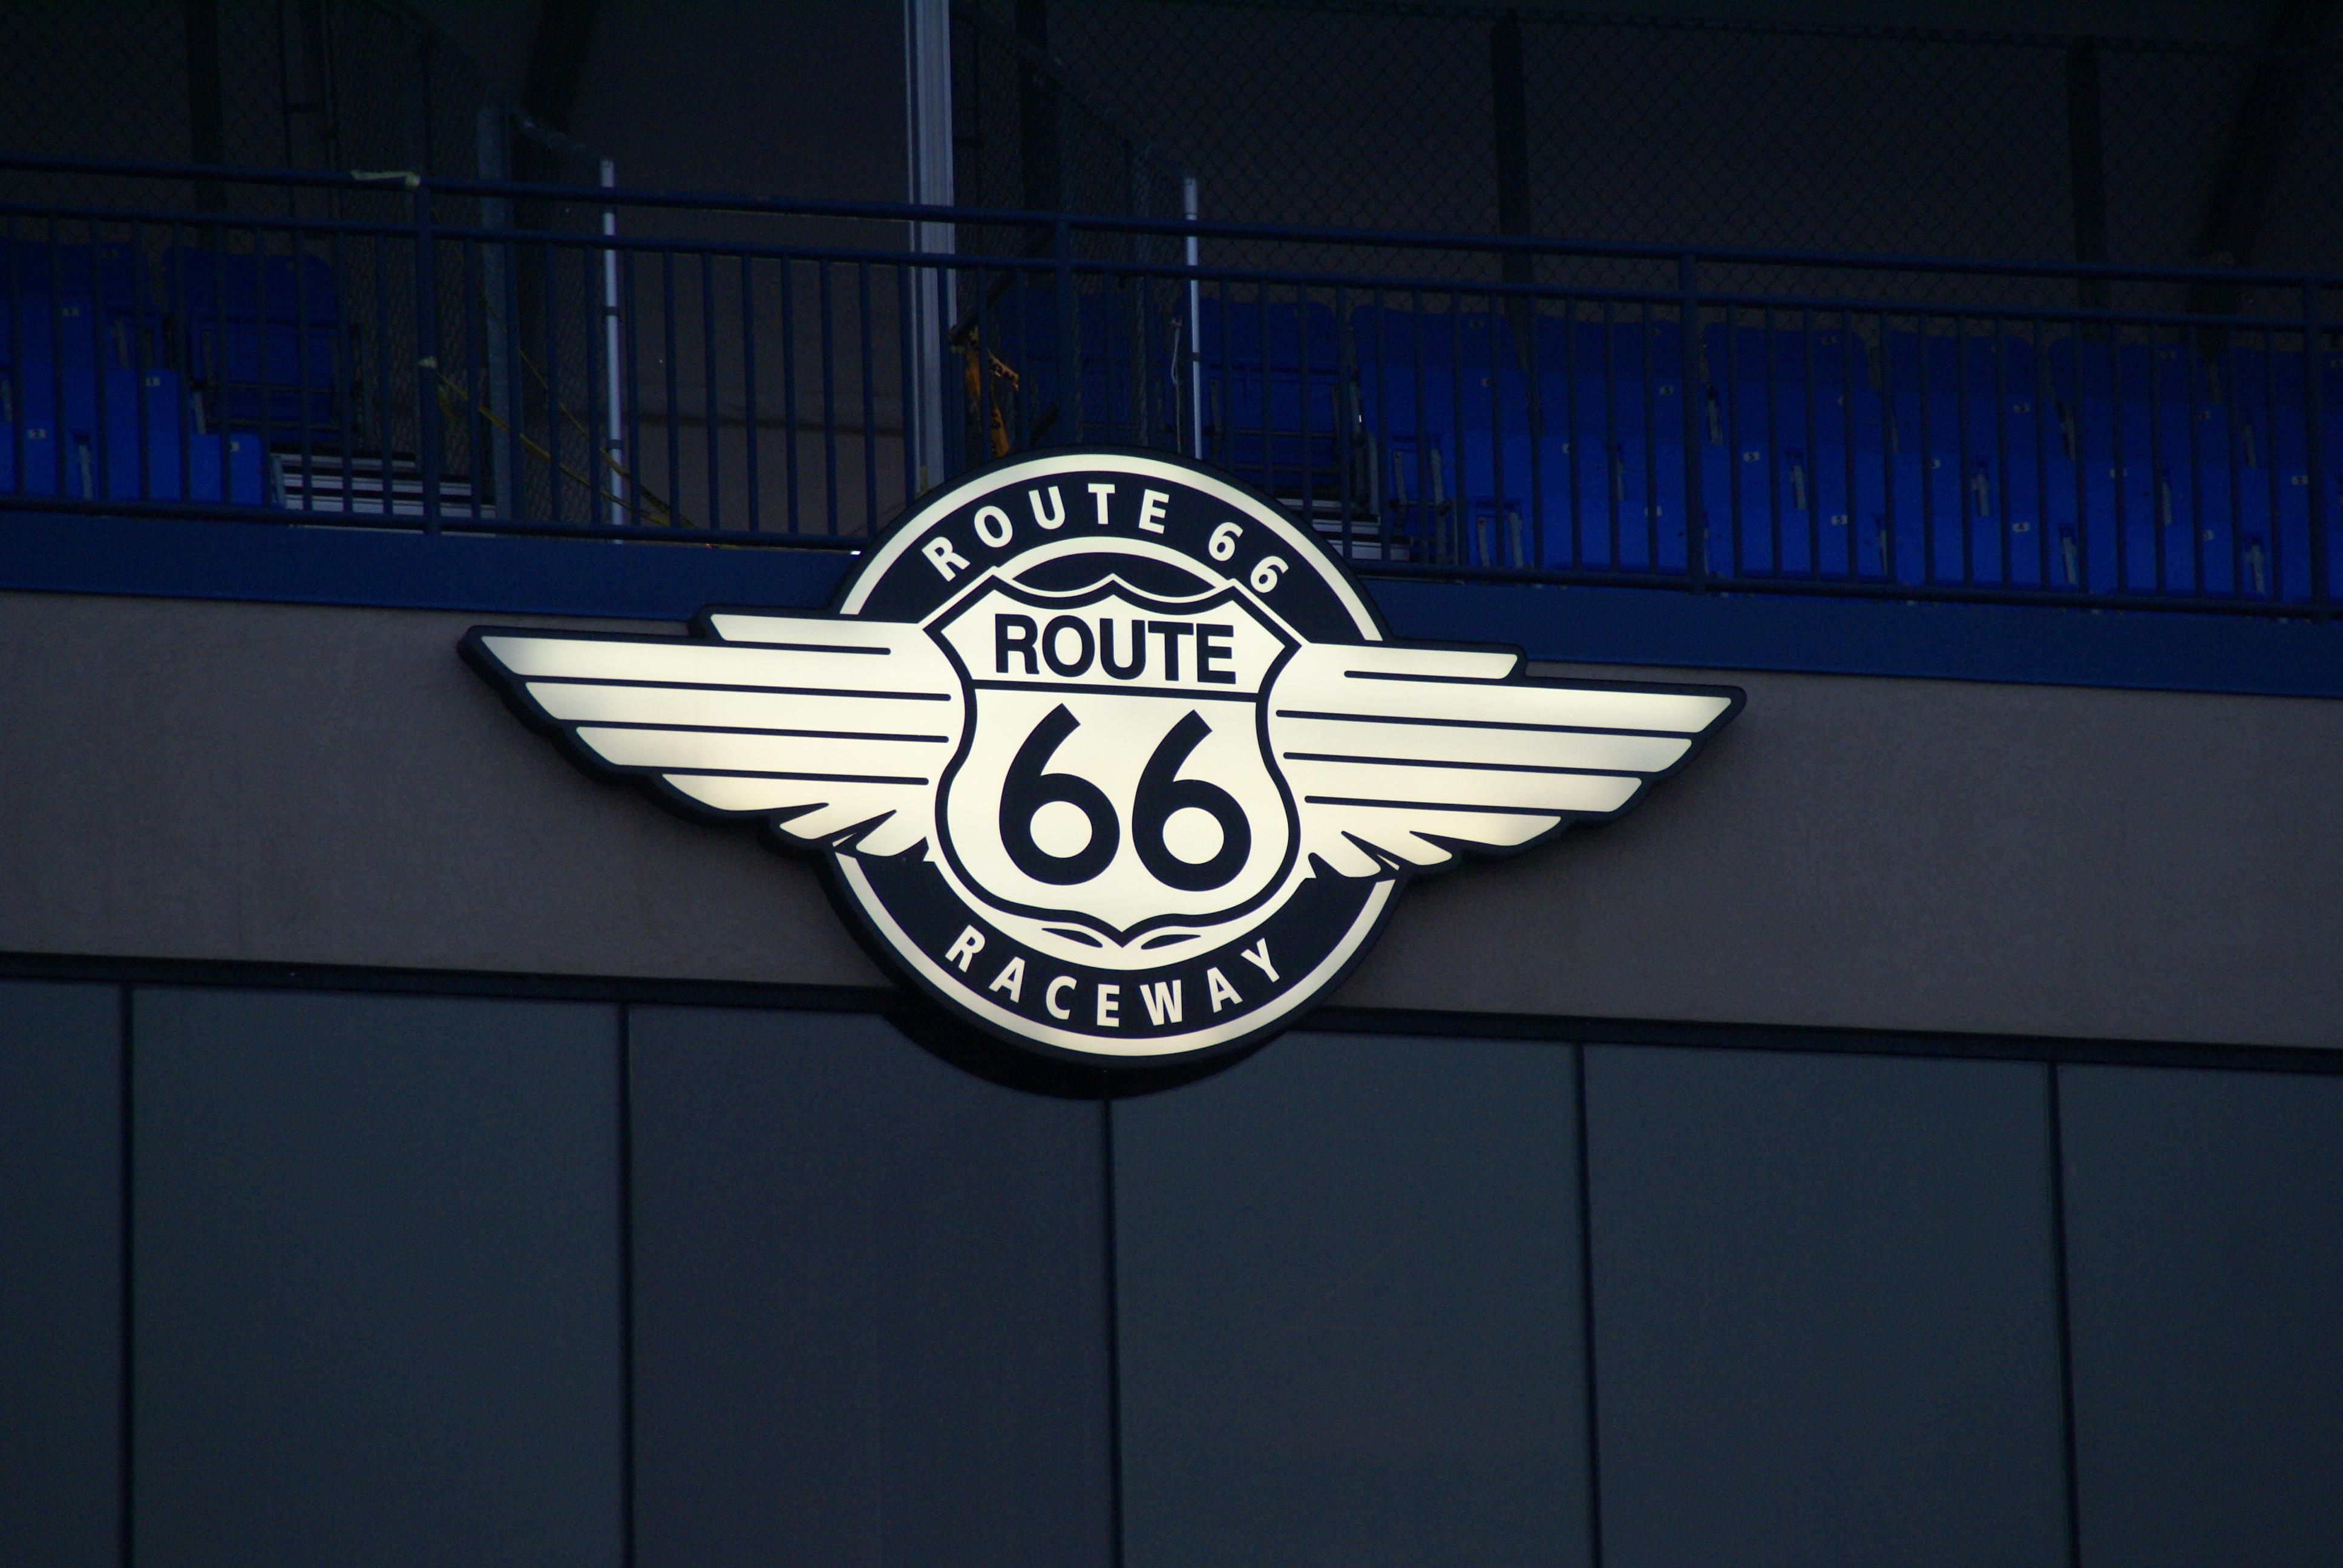 Route 66 Raceway - Wikipedia